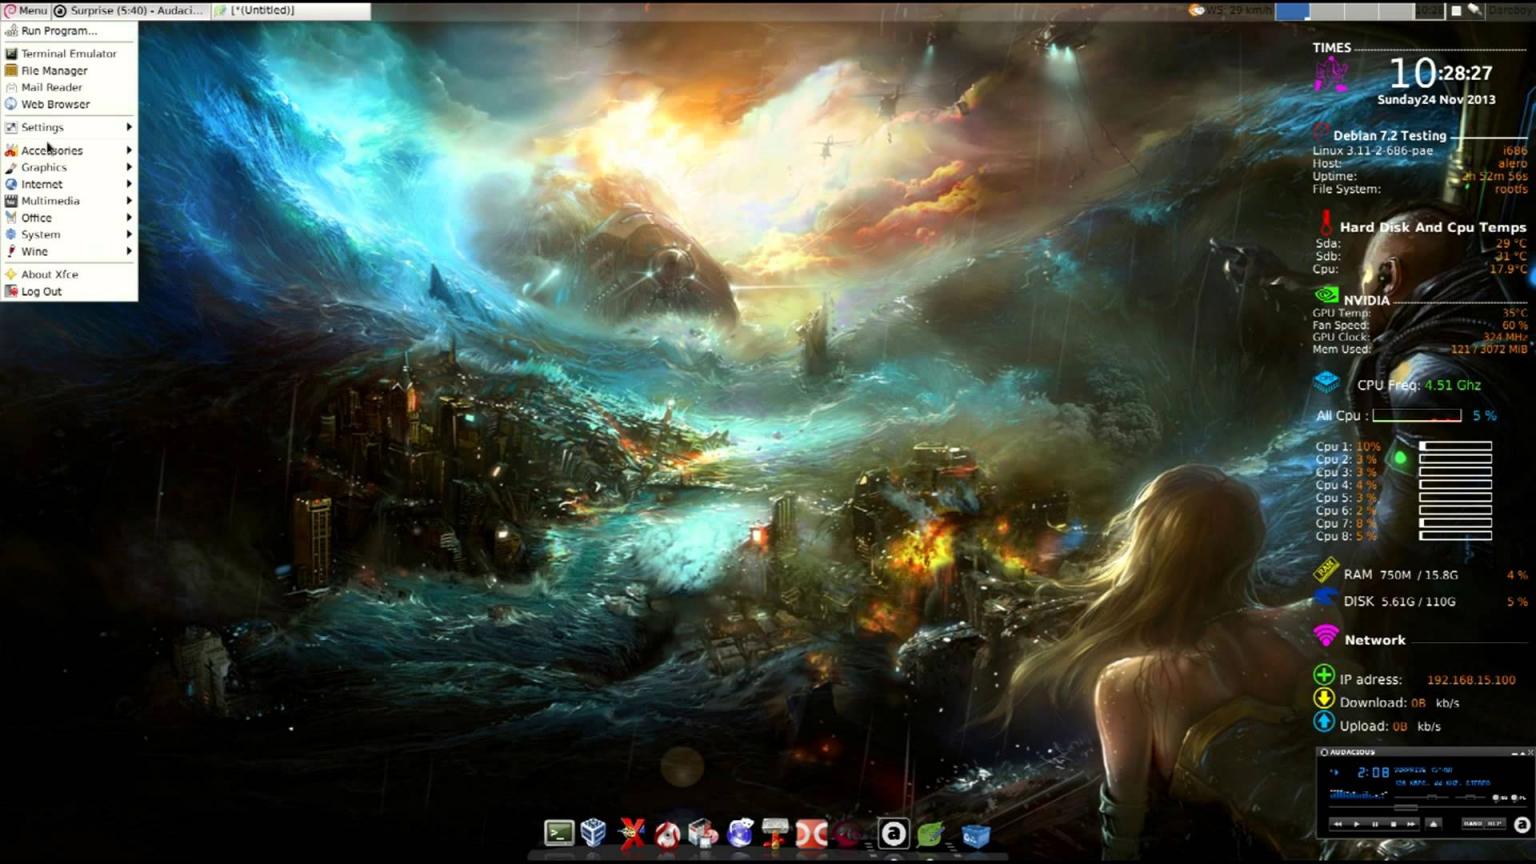 Free download Debian 8 Testing Jessie [1920x1080] for your Desktop